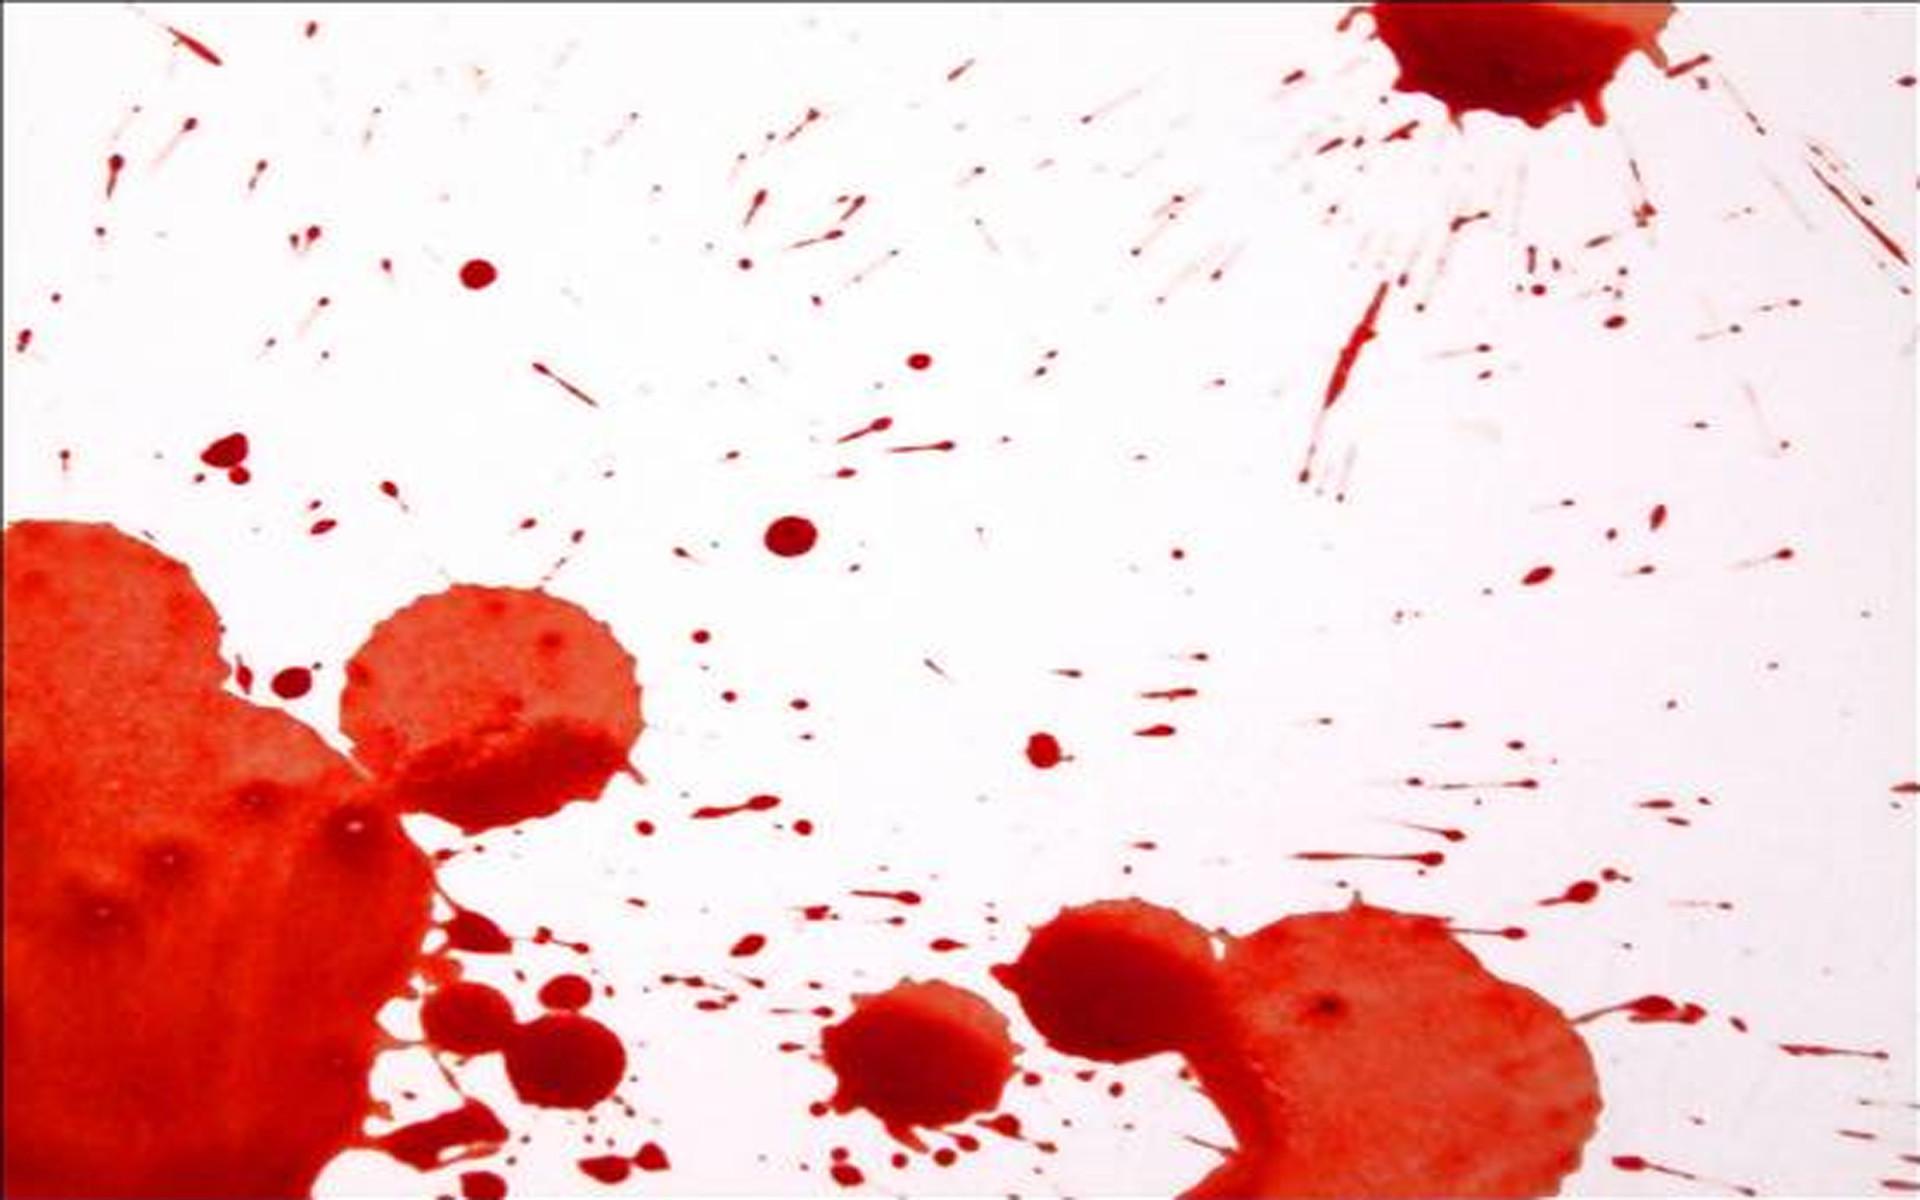 Blood Spatter Wallpaper Wallpapersafari